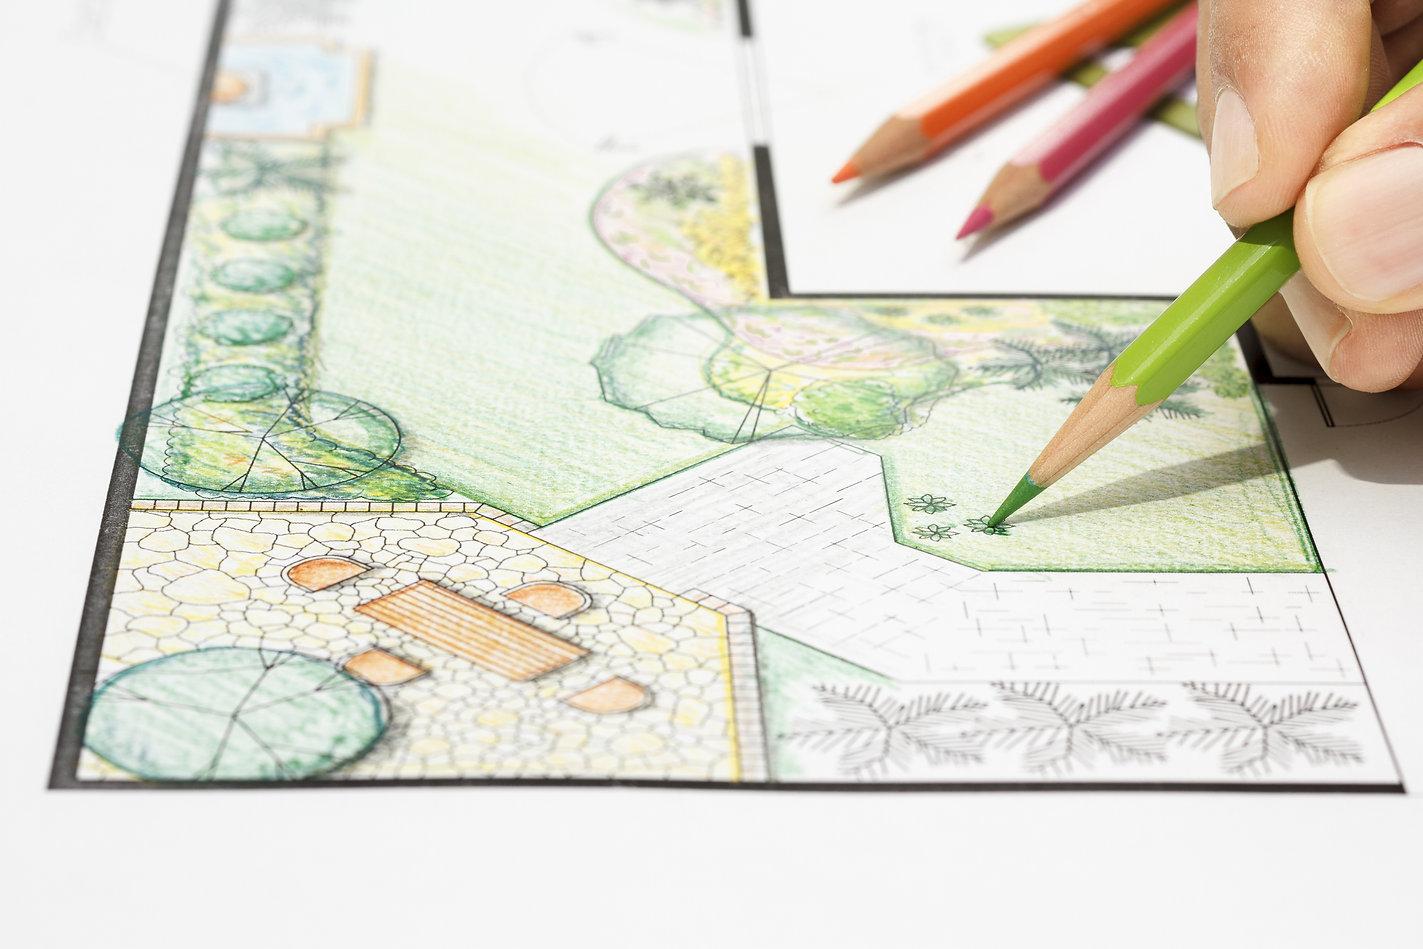 Cascade_Landscape_Architecture_Design.jp